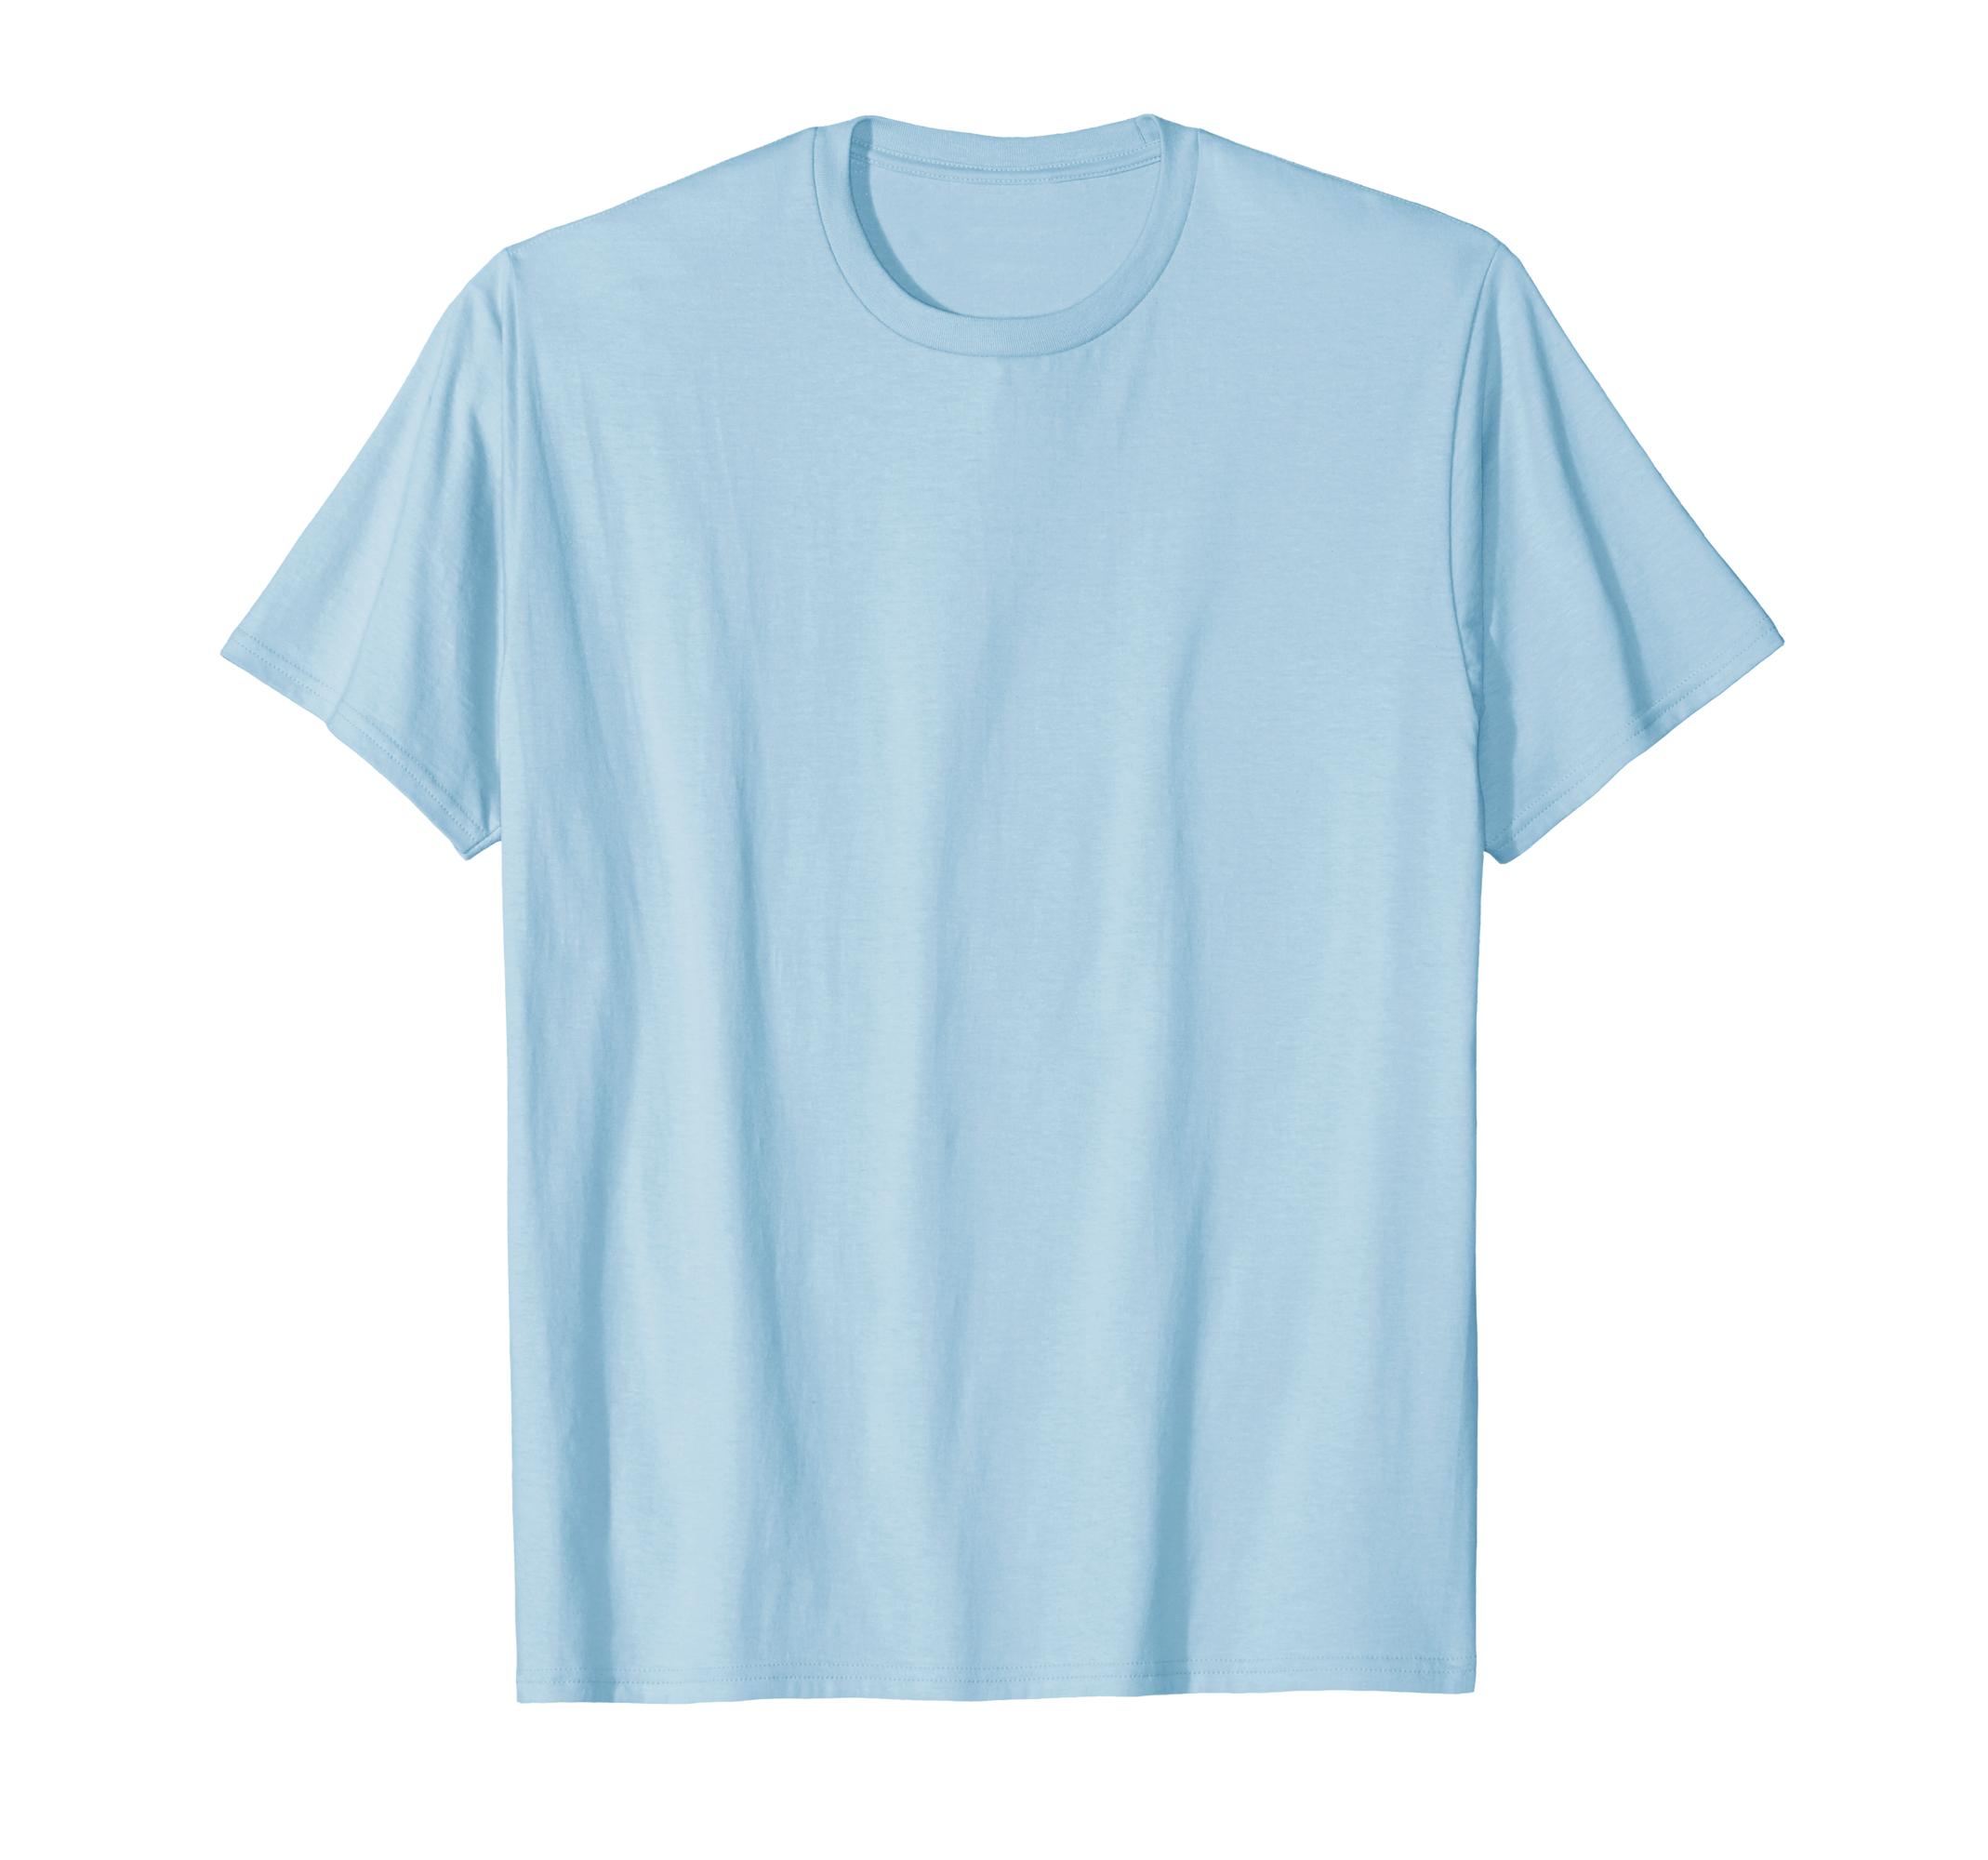 FREYA BIKINI TOP SUMMER TIDE 28E 28GG MOULDED PADDED PLUNGE BRA BLUE WHITE 4471